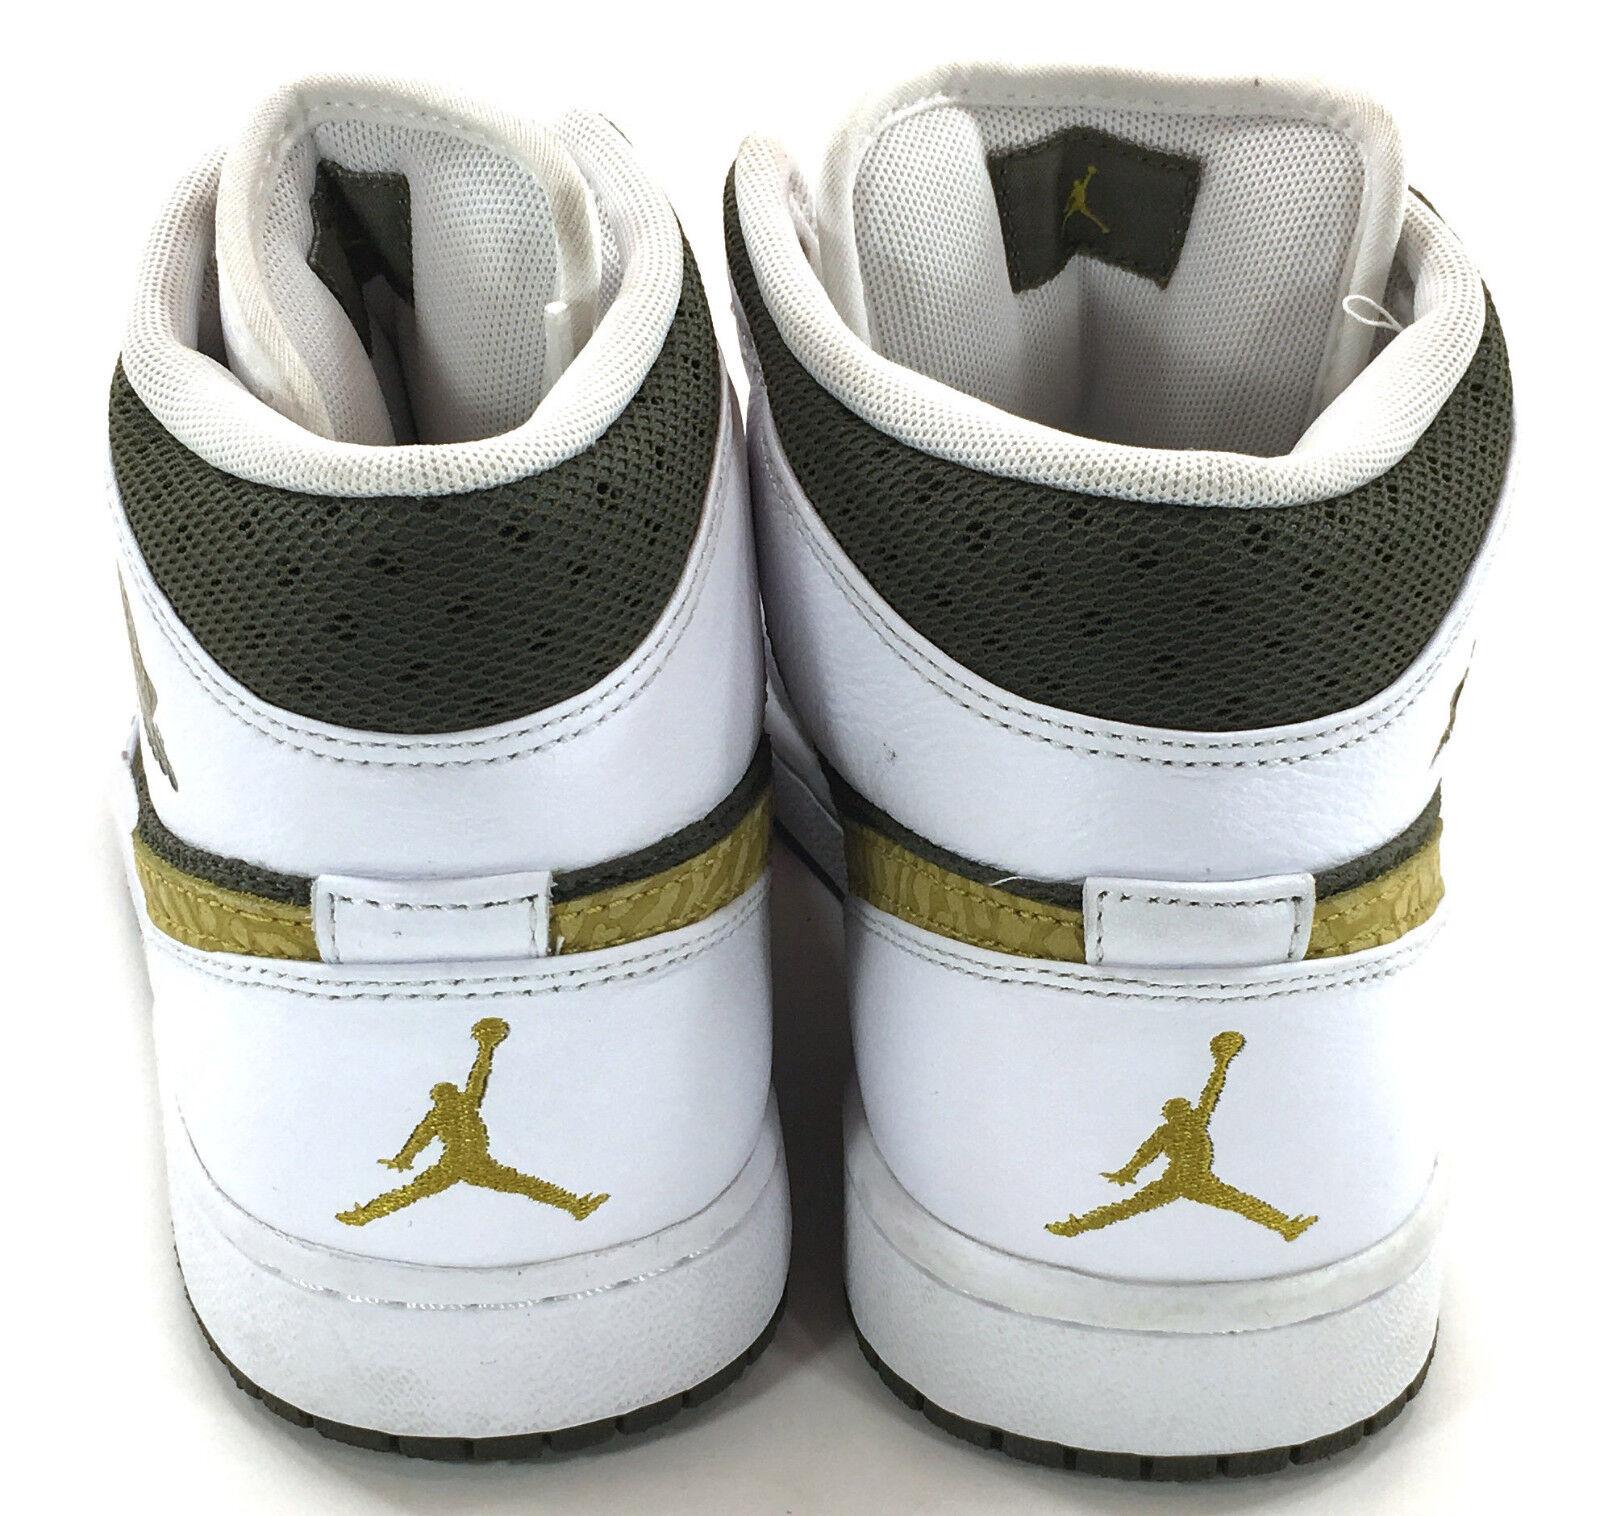 e296a423a3b4f6 ... Nike Shoes Jordan 1 Phat Mid White Cargo Khaki Peat Moss Moss Moss  Sneakers ...